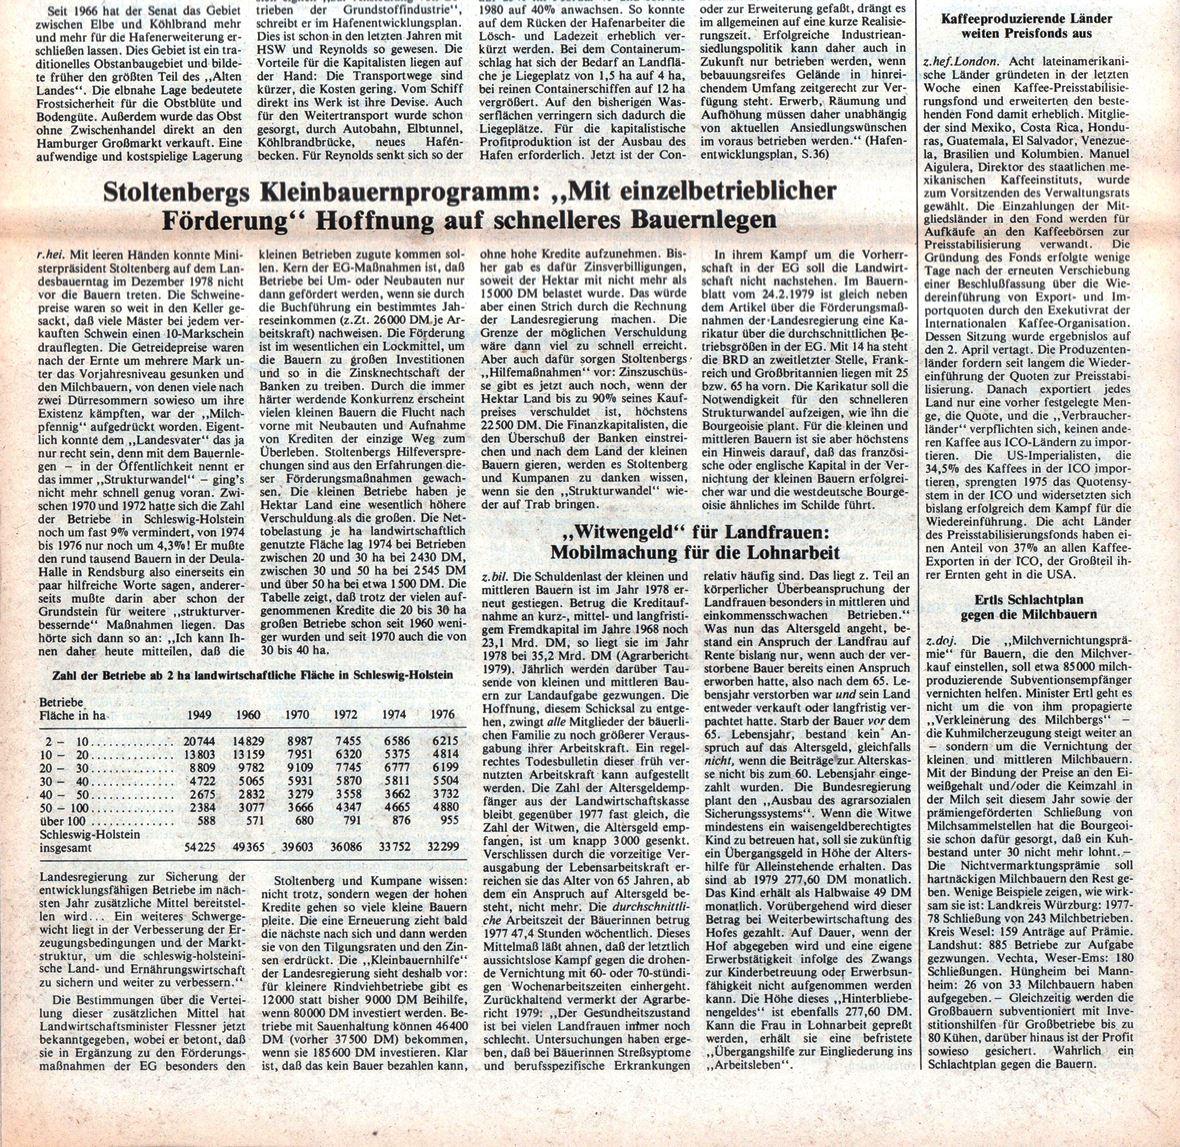 Hamburg_KVZ_1979_10_18